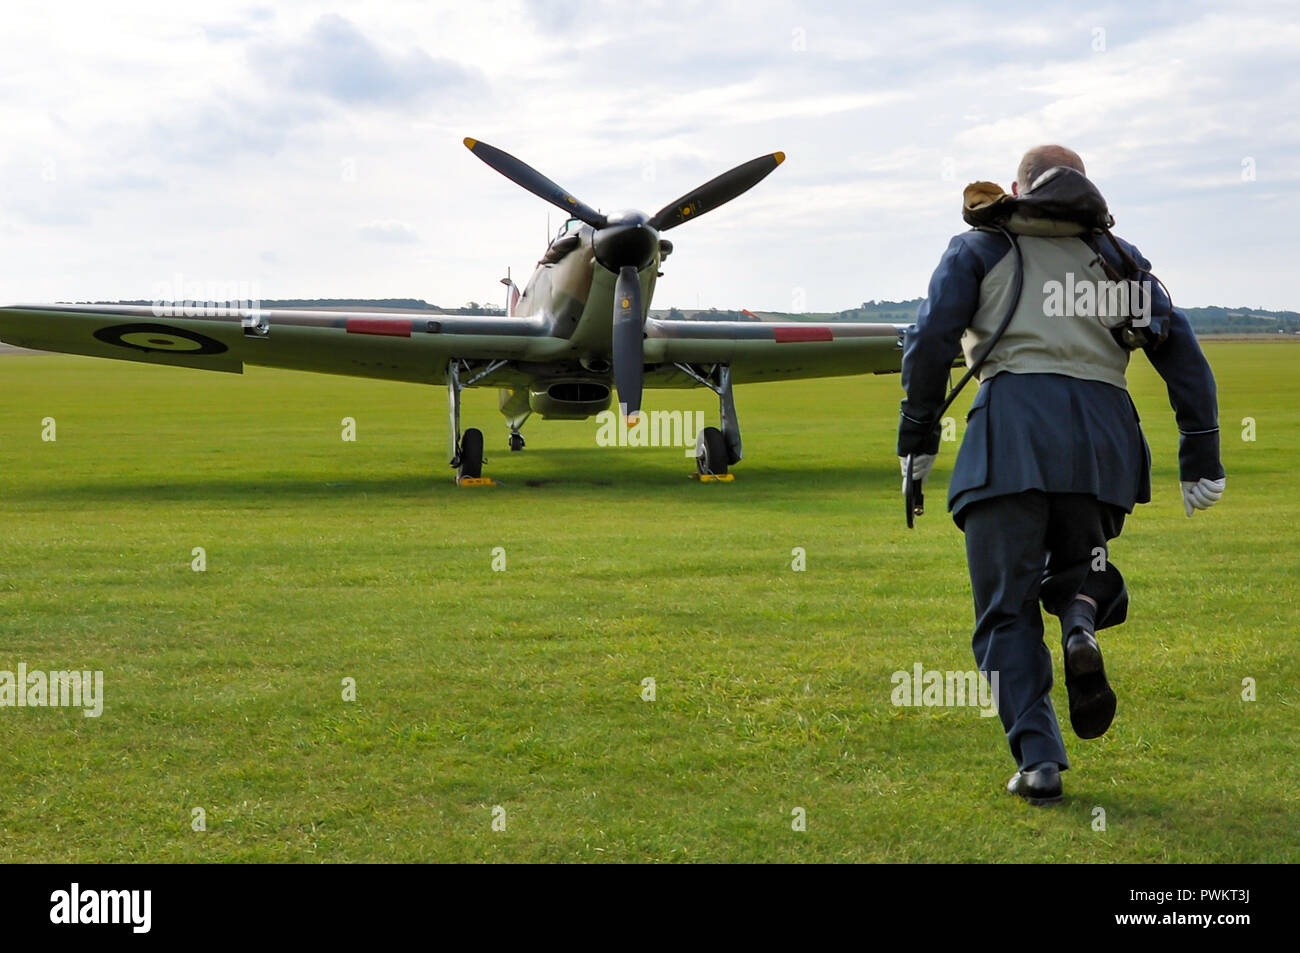 Battle of Britain scramble recreation. RAF Royal Air Force Second World War pilot re-enactor runs towards Hawker Hurricane fighter plane - Stock Image